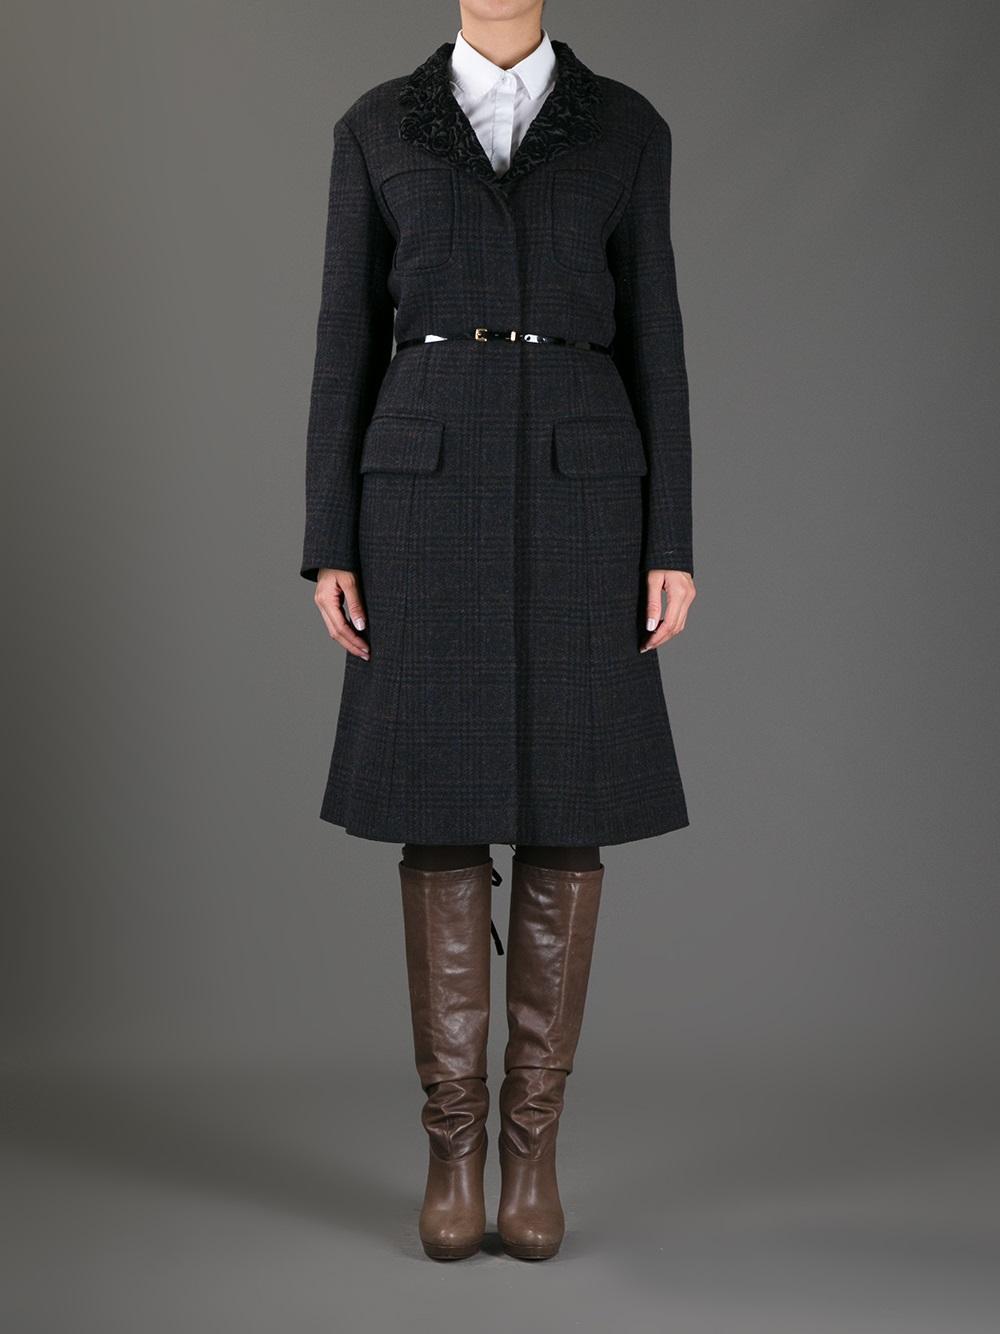 Nina ricci Tweed Belted Coat in Black | Lyst